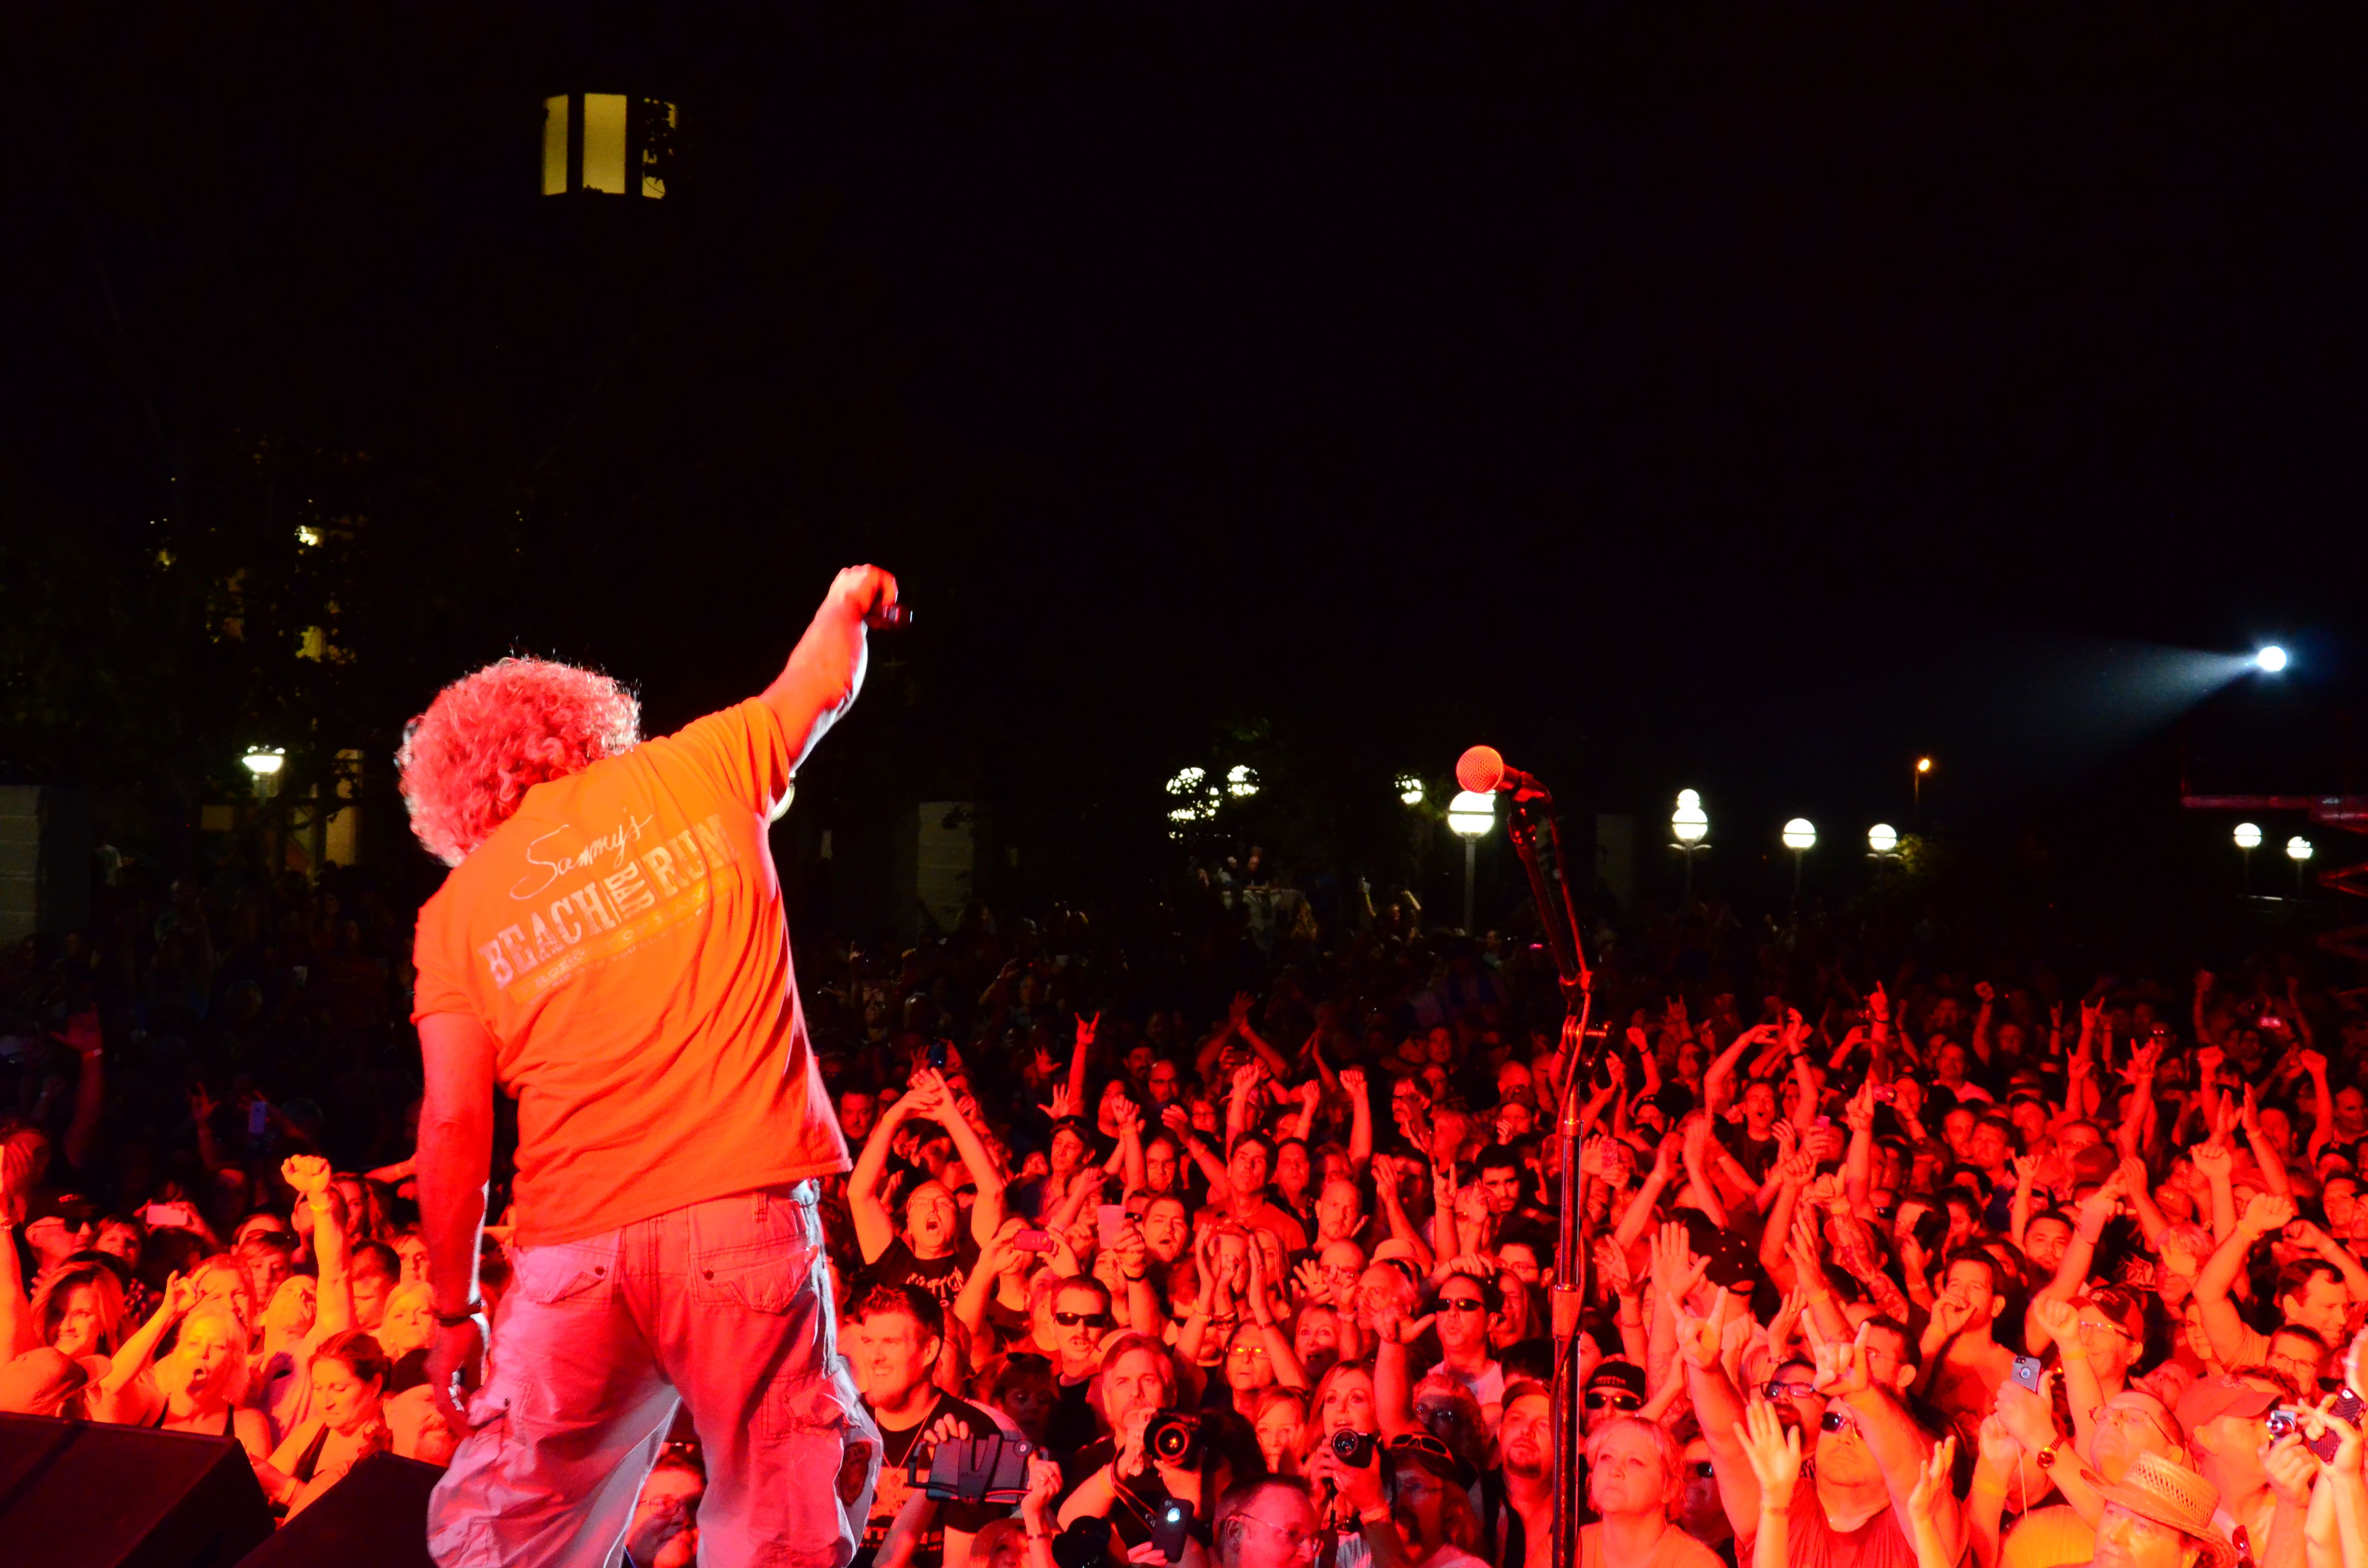 Sammy Hagar Concert In Vernon Street Town Square 9 13 14 Concert Photo Roseville